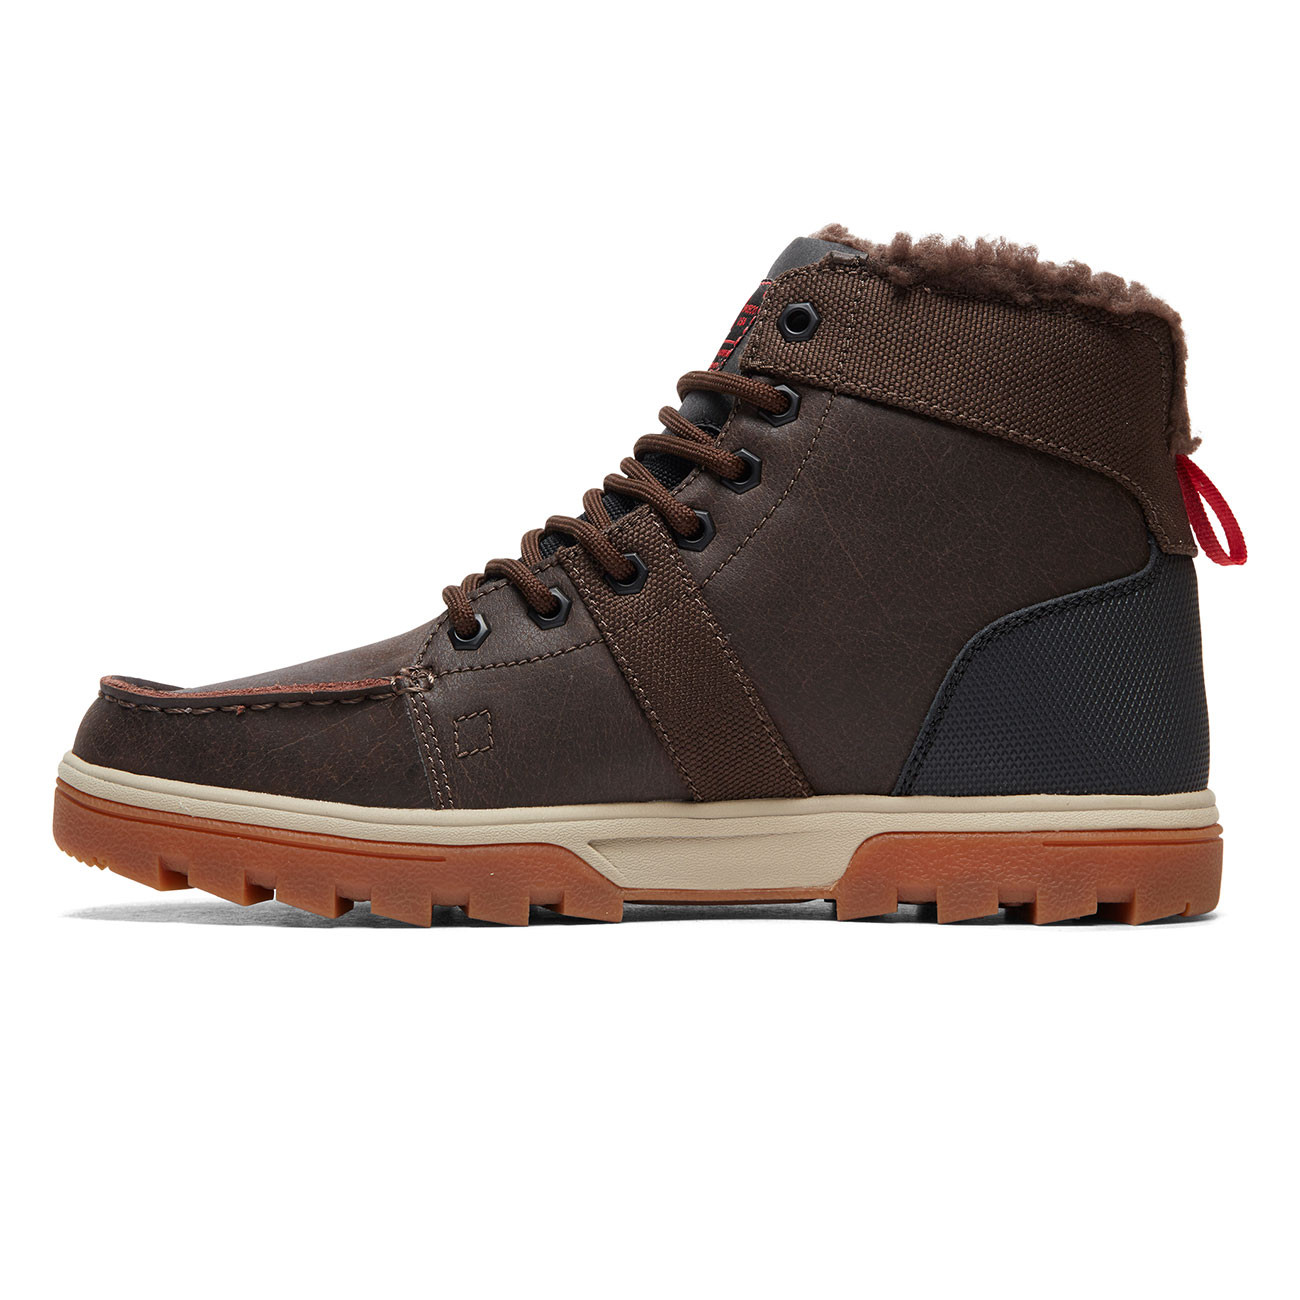 Zimní boty DC Woodland brown green black  941f4dc921